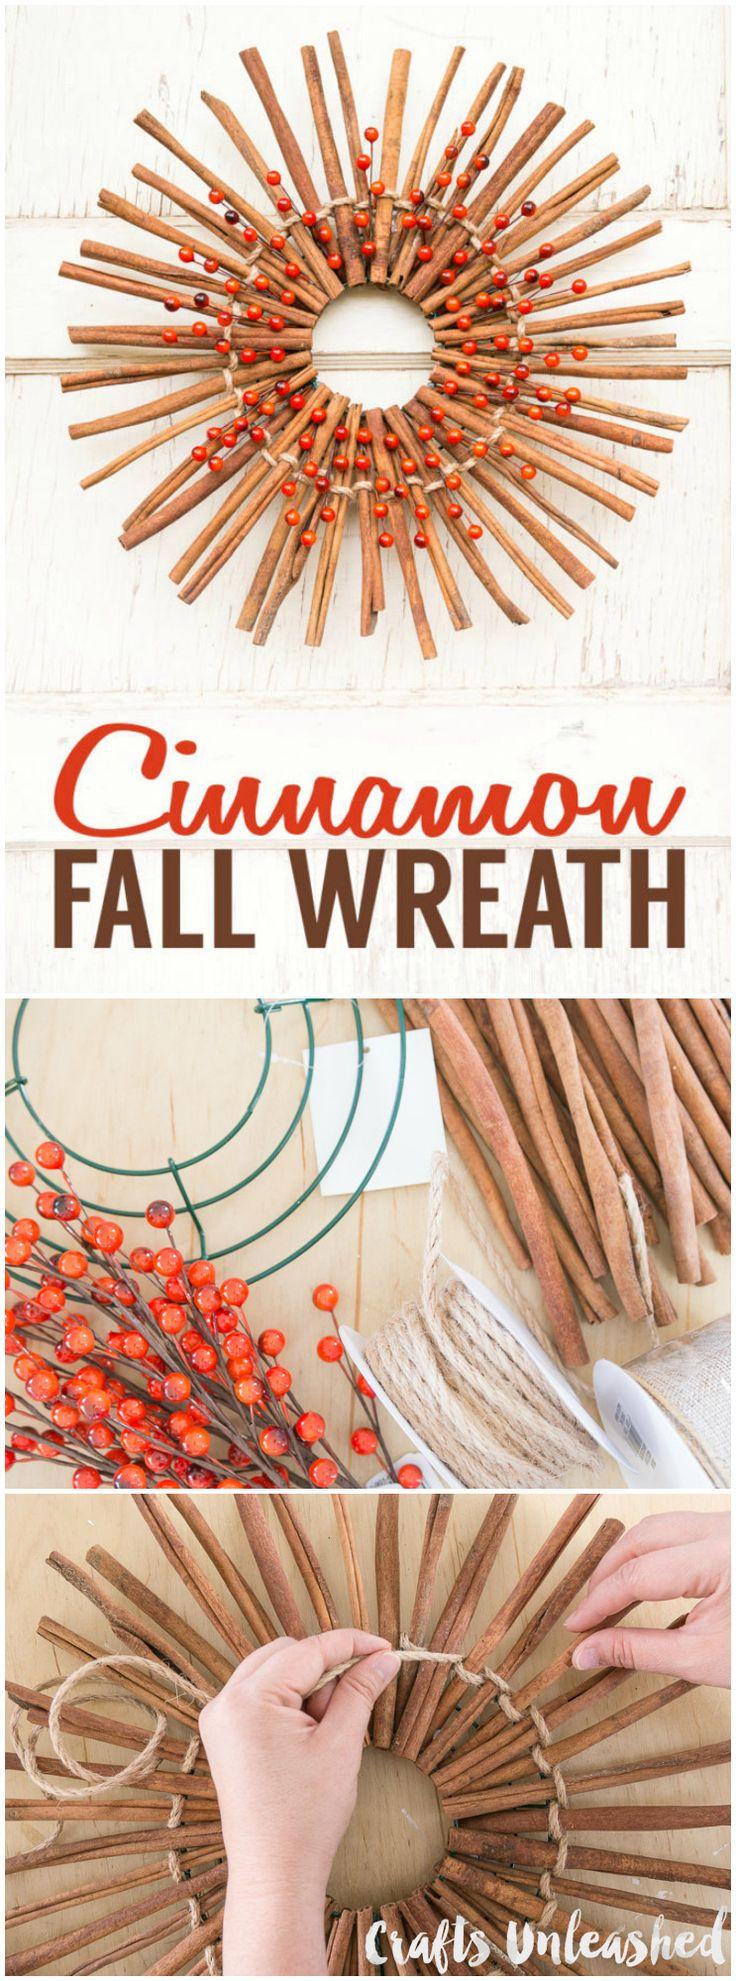 Rustic Cinnamon Stick Wreath